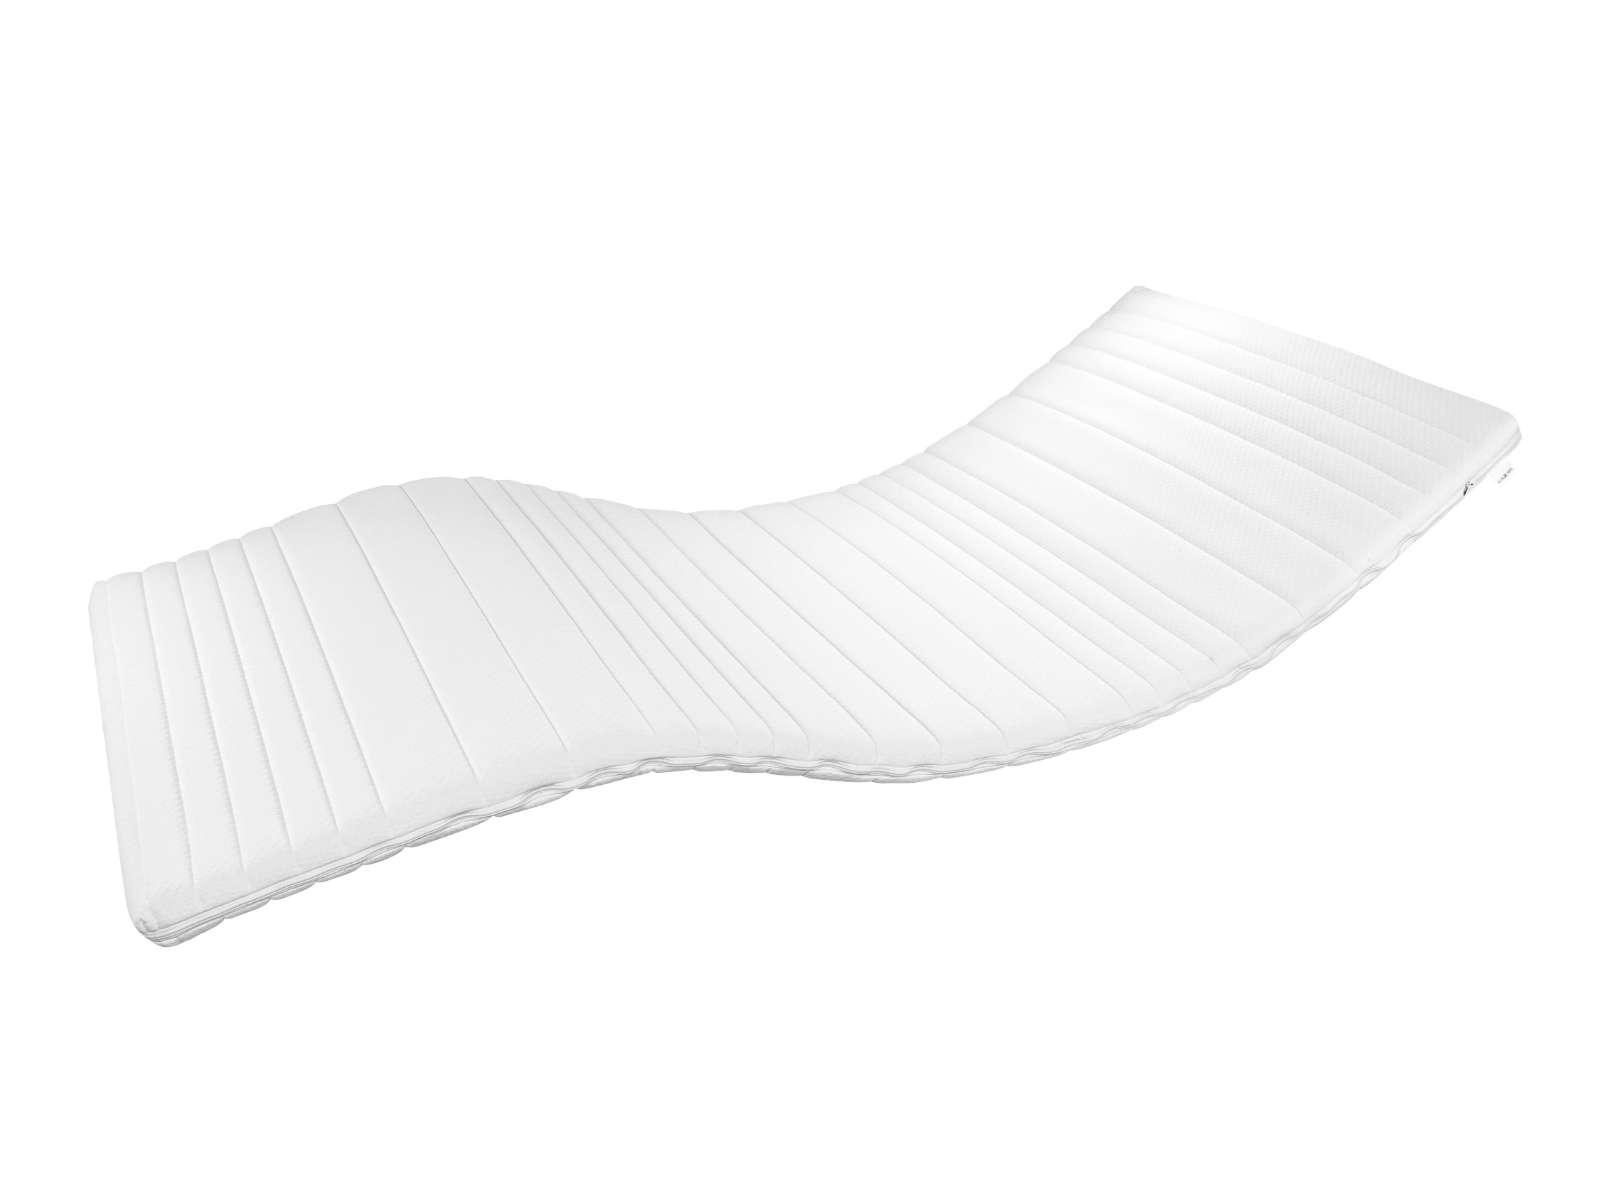 Komfort Topper Matratzenauflage Doppeltuch-Bezug 140x200 160x200 180x200 200x200